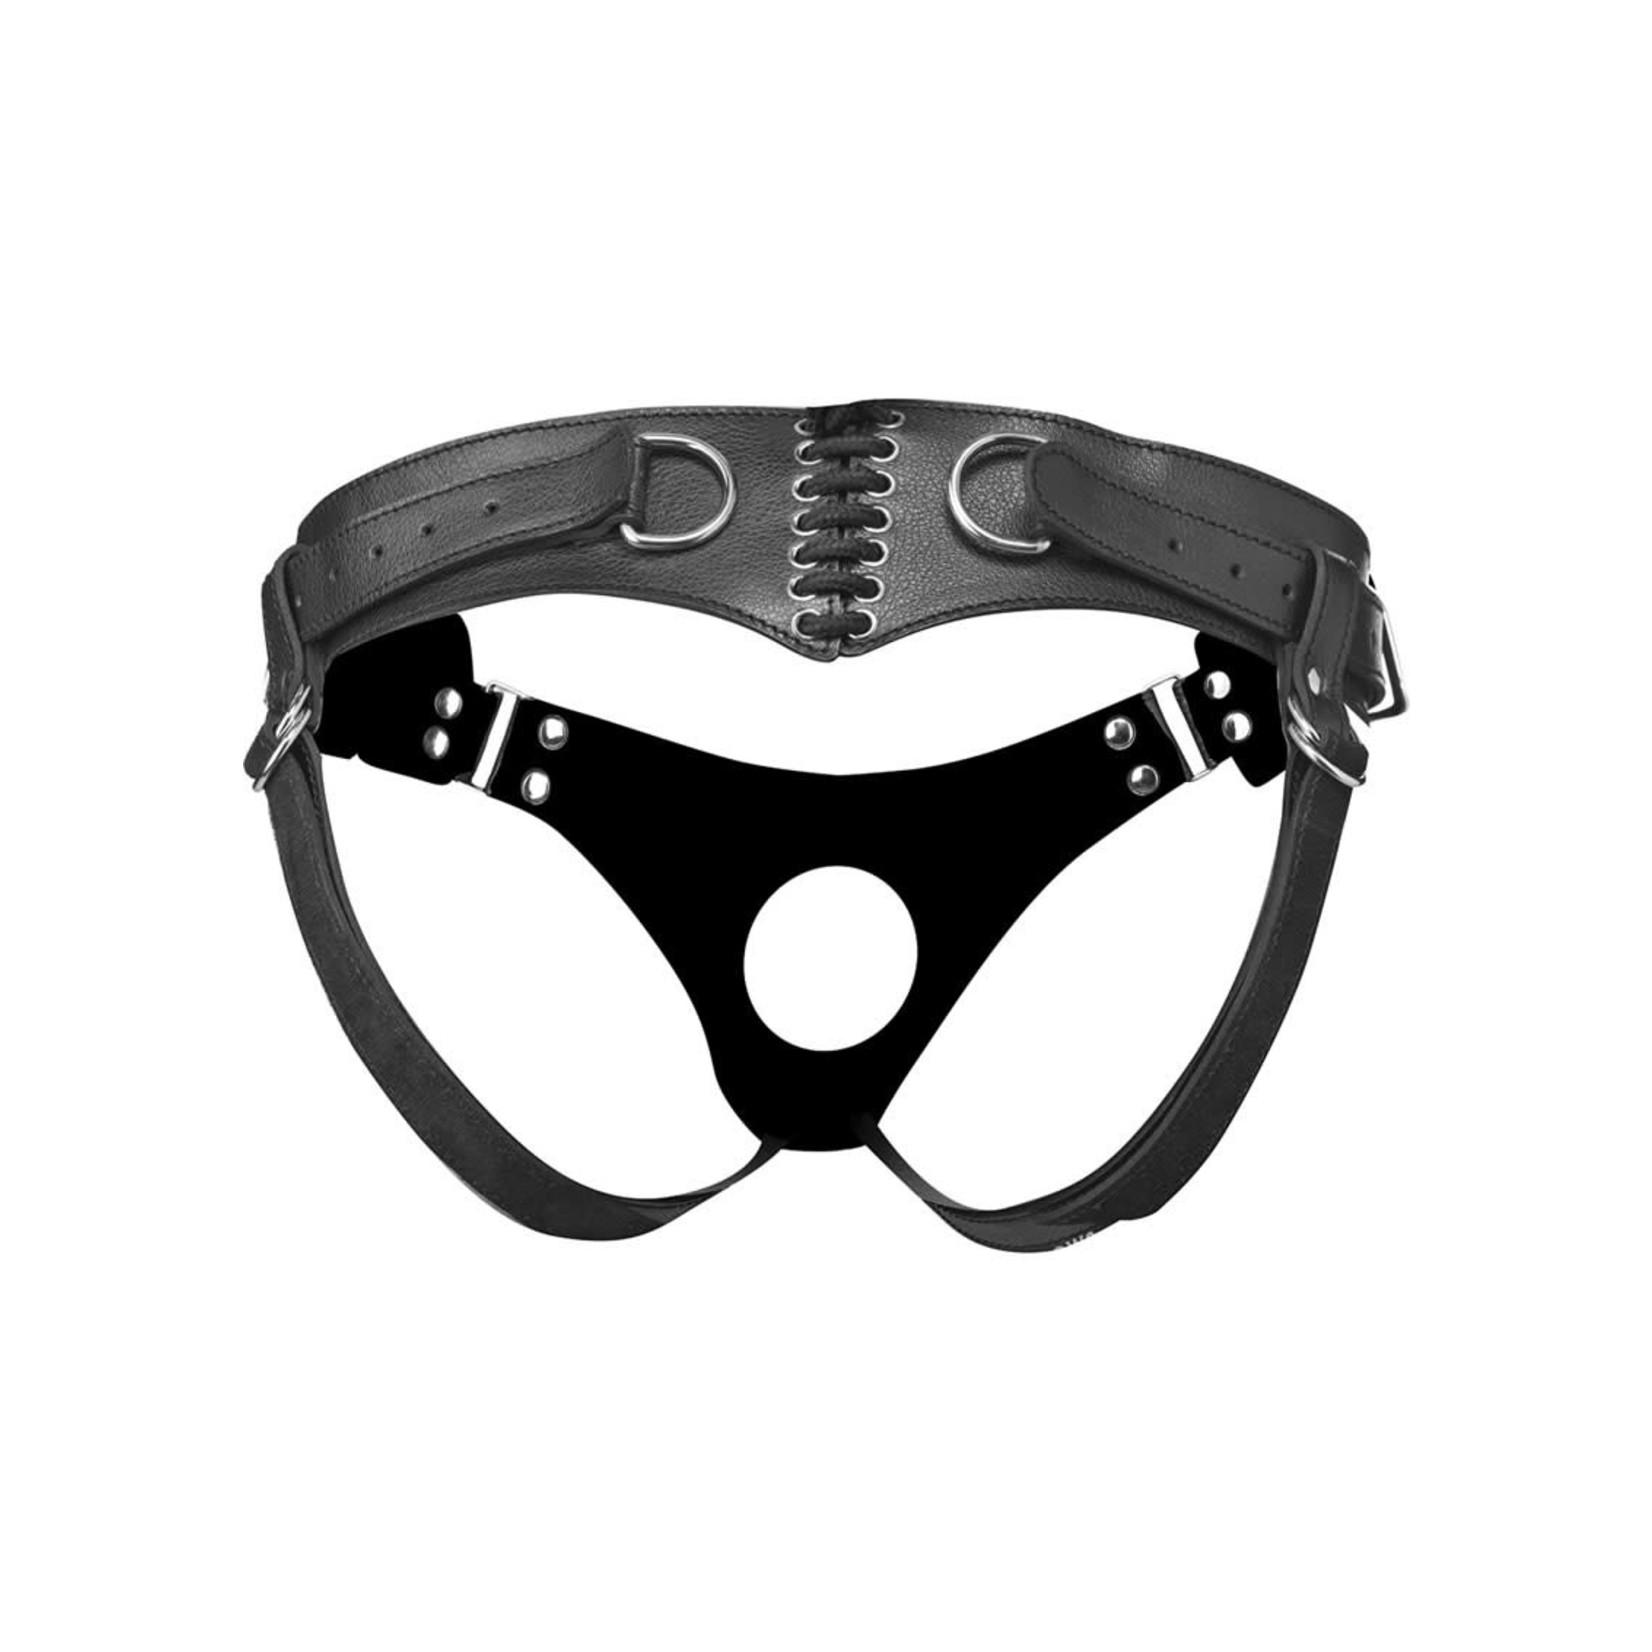 Strap U Bodice Corset Style Strap On Harness - Black